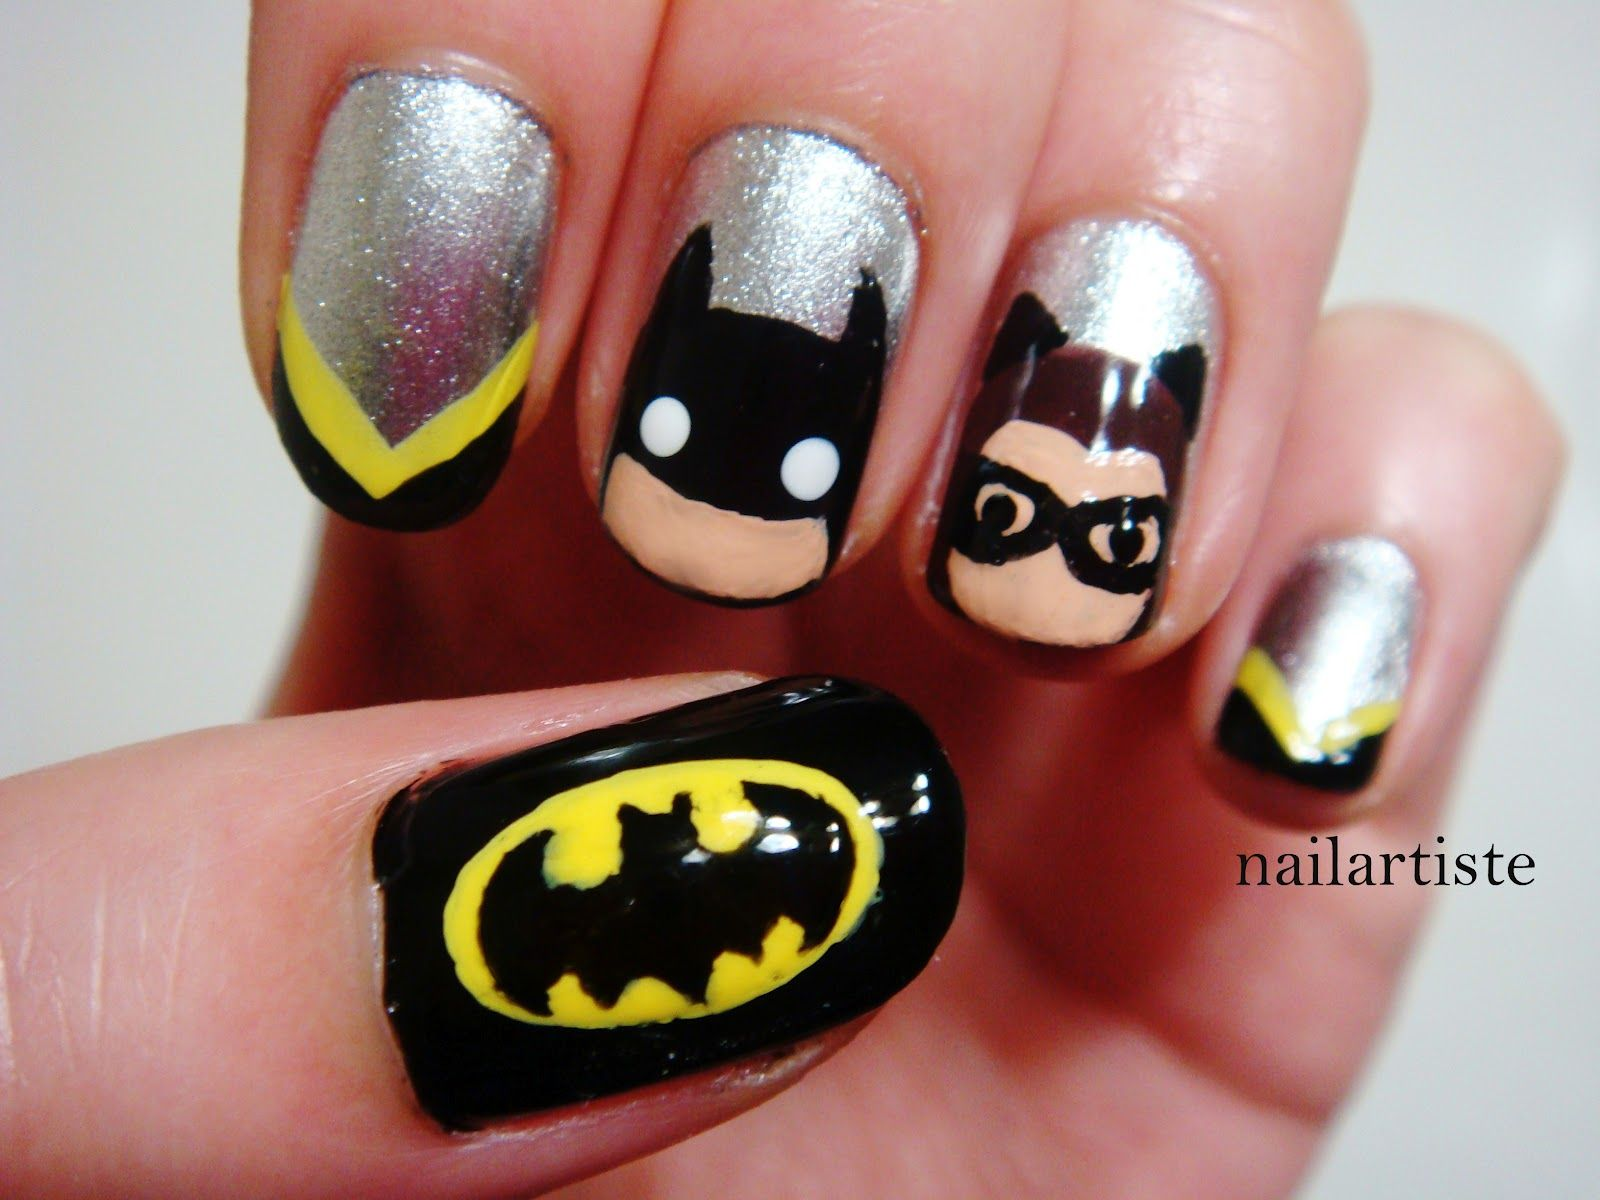 The Nail Artiste Batman And Catwoman Nails Pinterest Batman